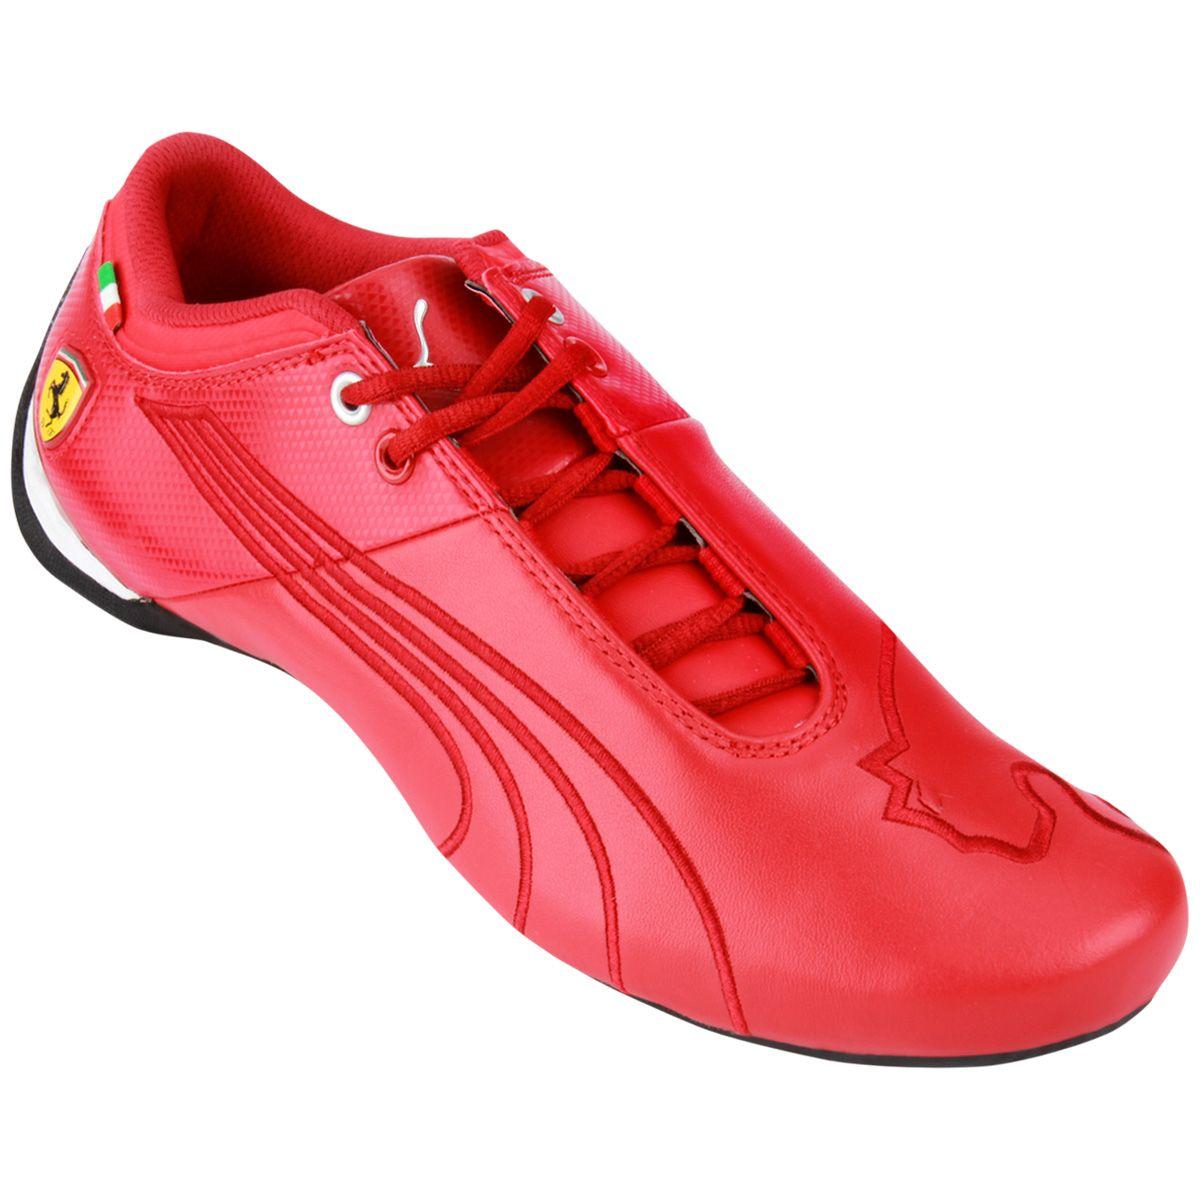 8d8549bee Oferta Tenis Puma Ferrari Future Cat M1 Piel 100% Originales - $ 1,999.00